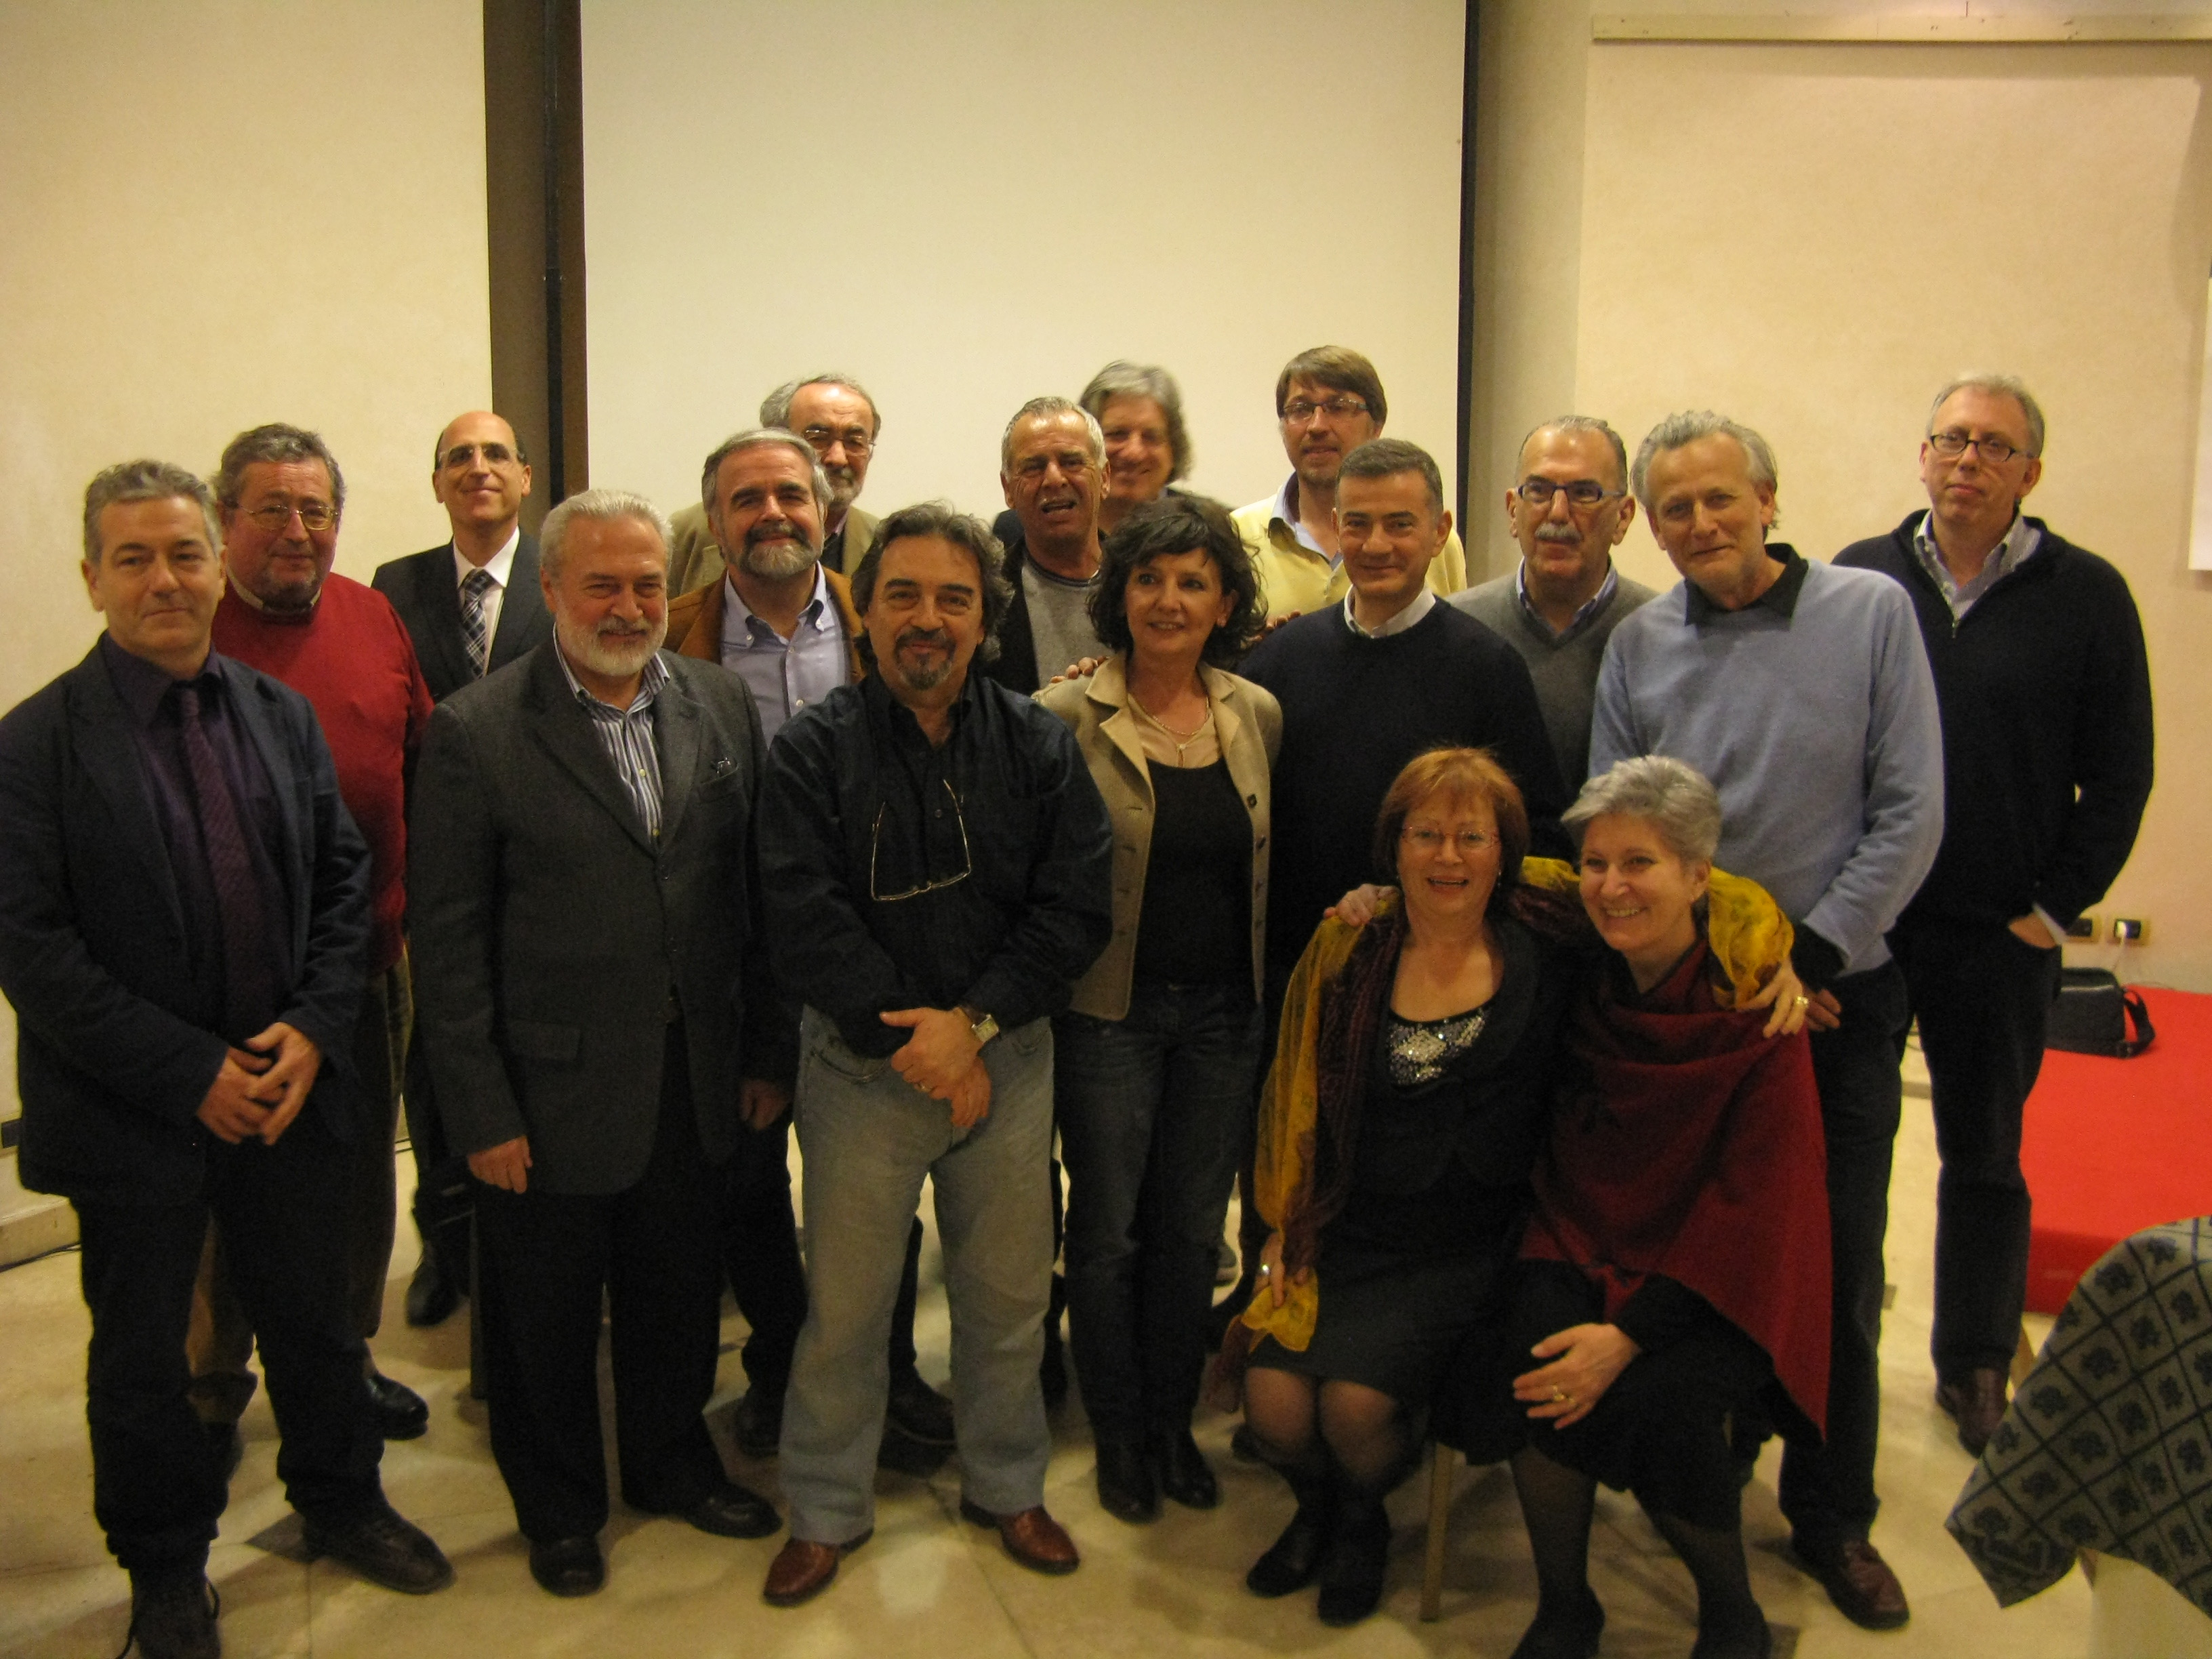 2012-firmatari-chianciano-2012